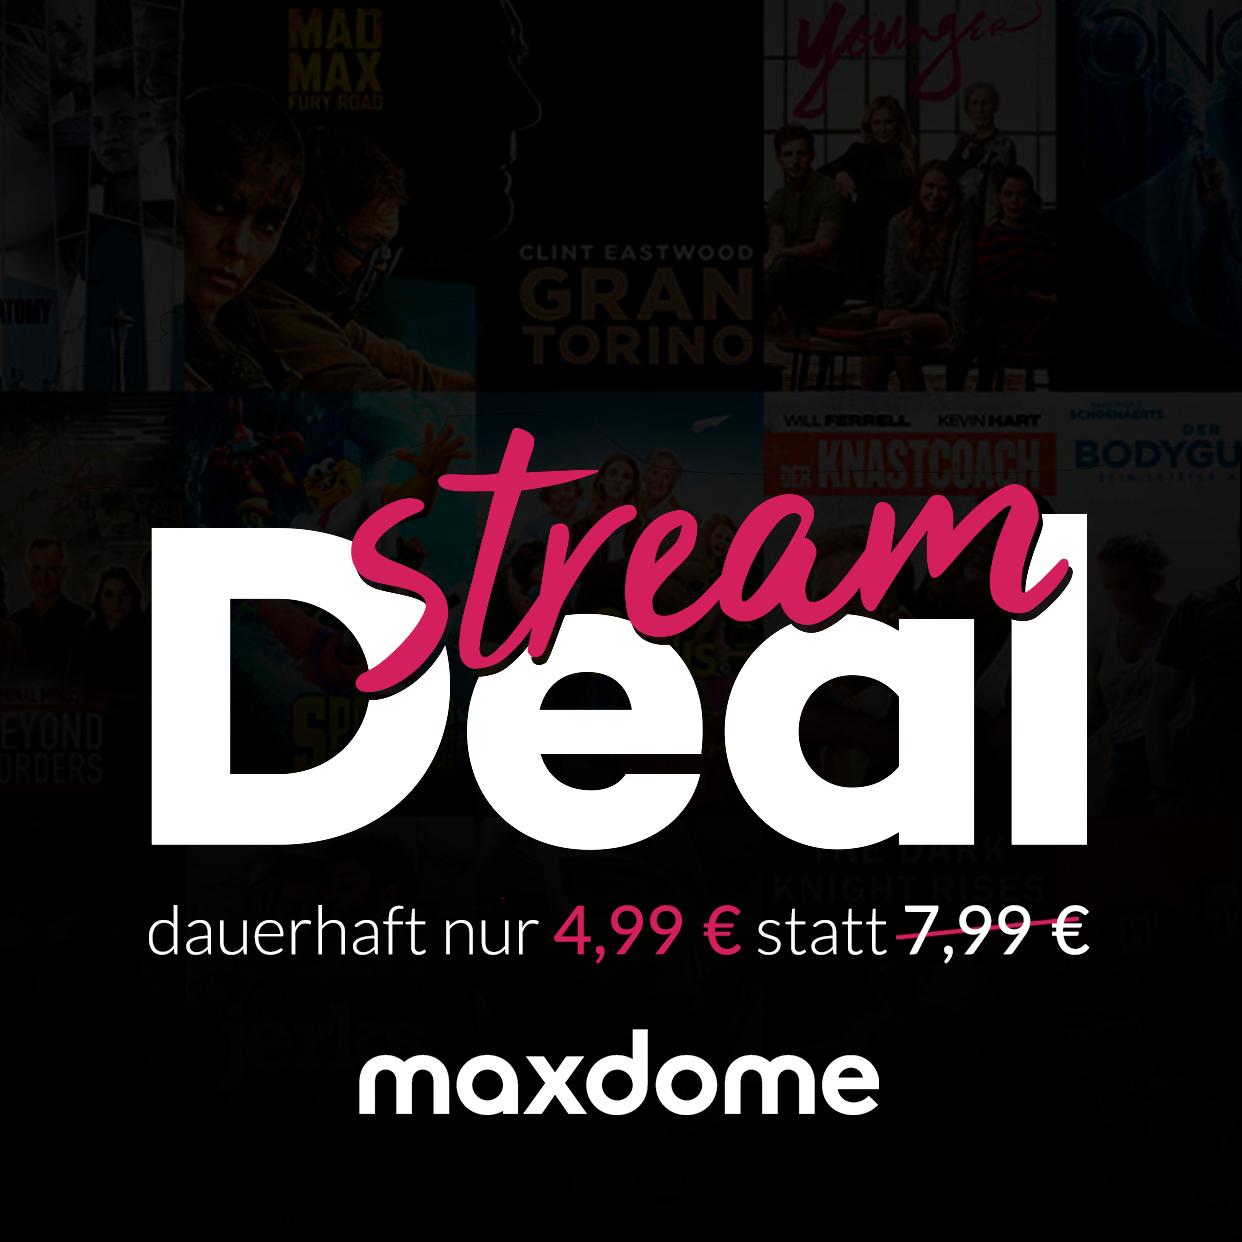 maxdome Stream Deal